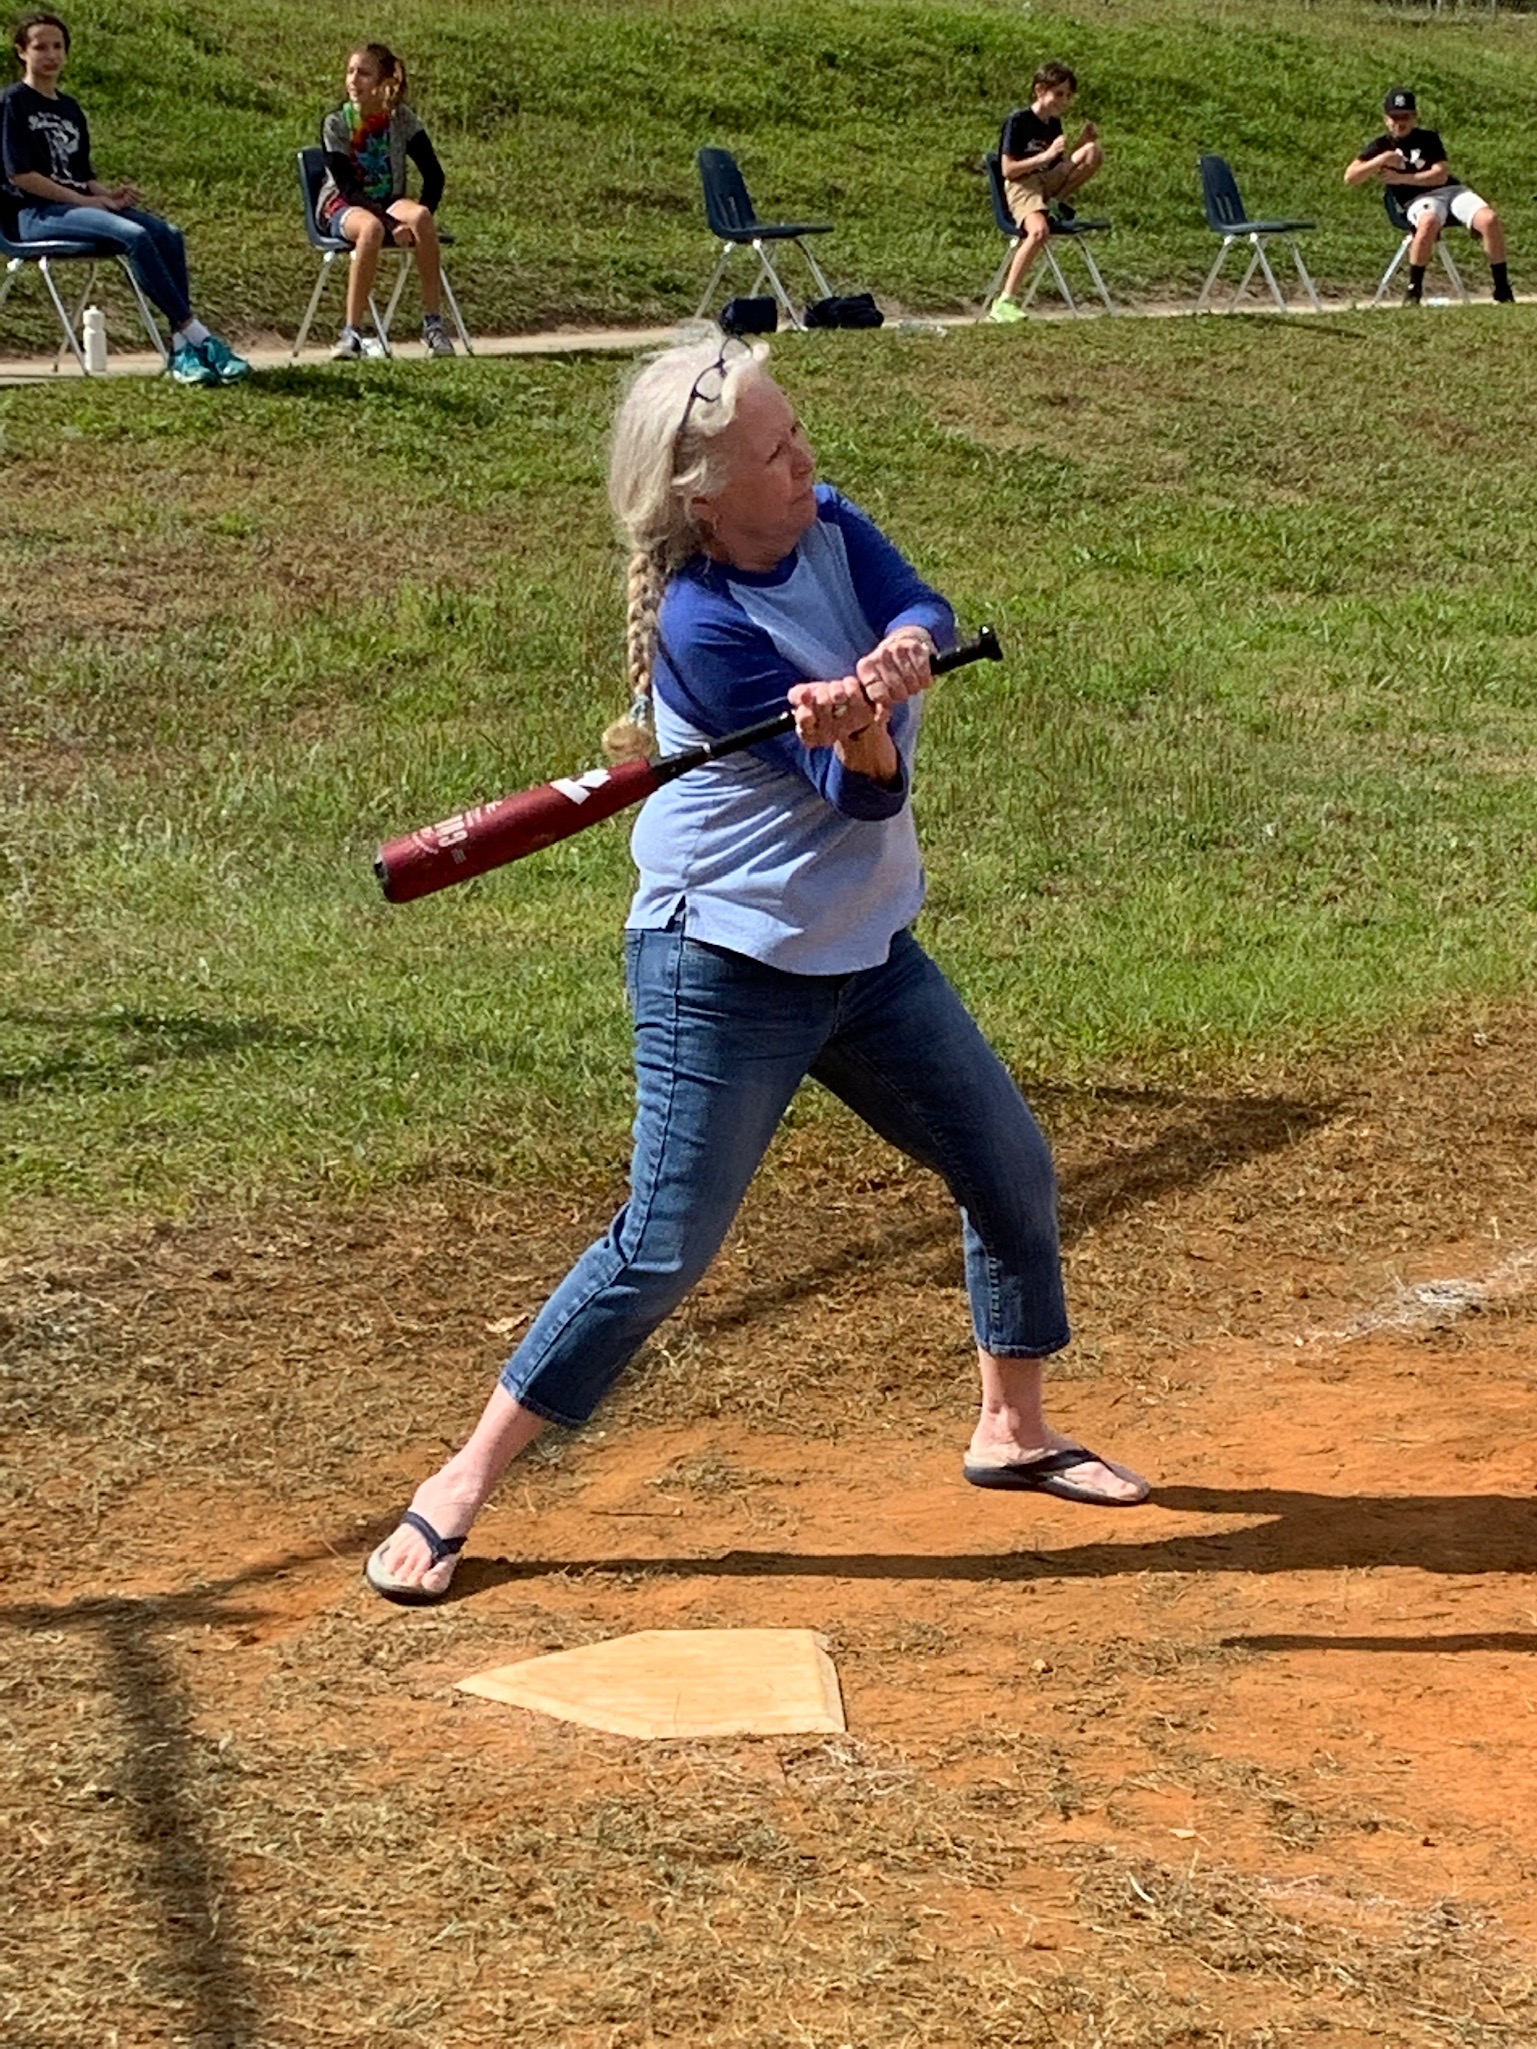 Mrs. Landen up to bat